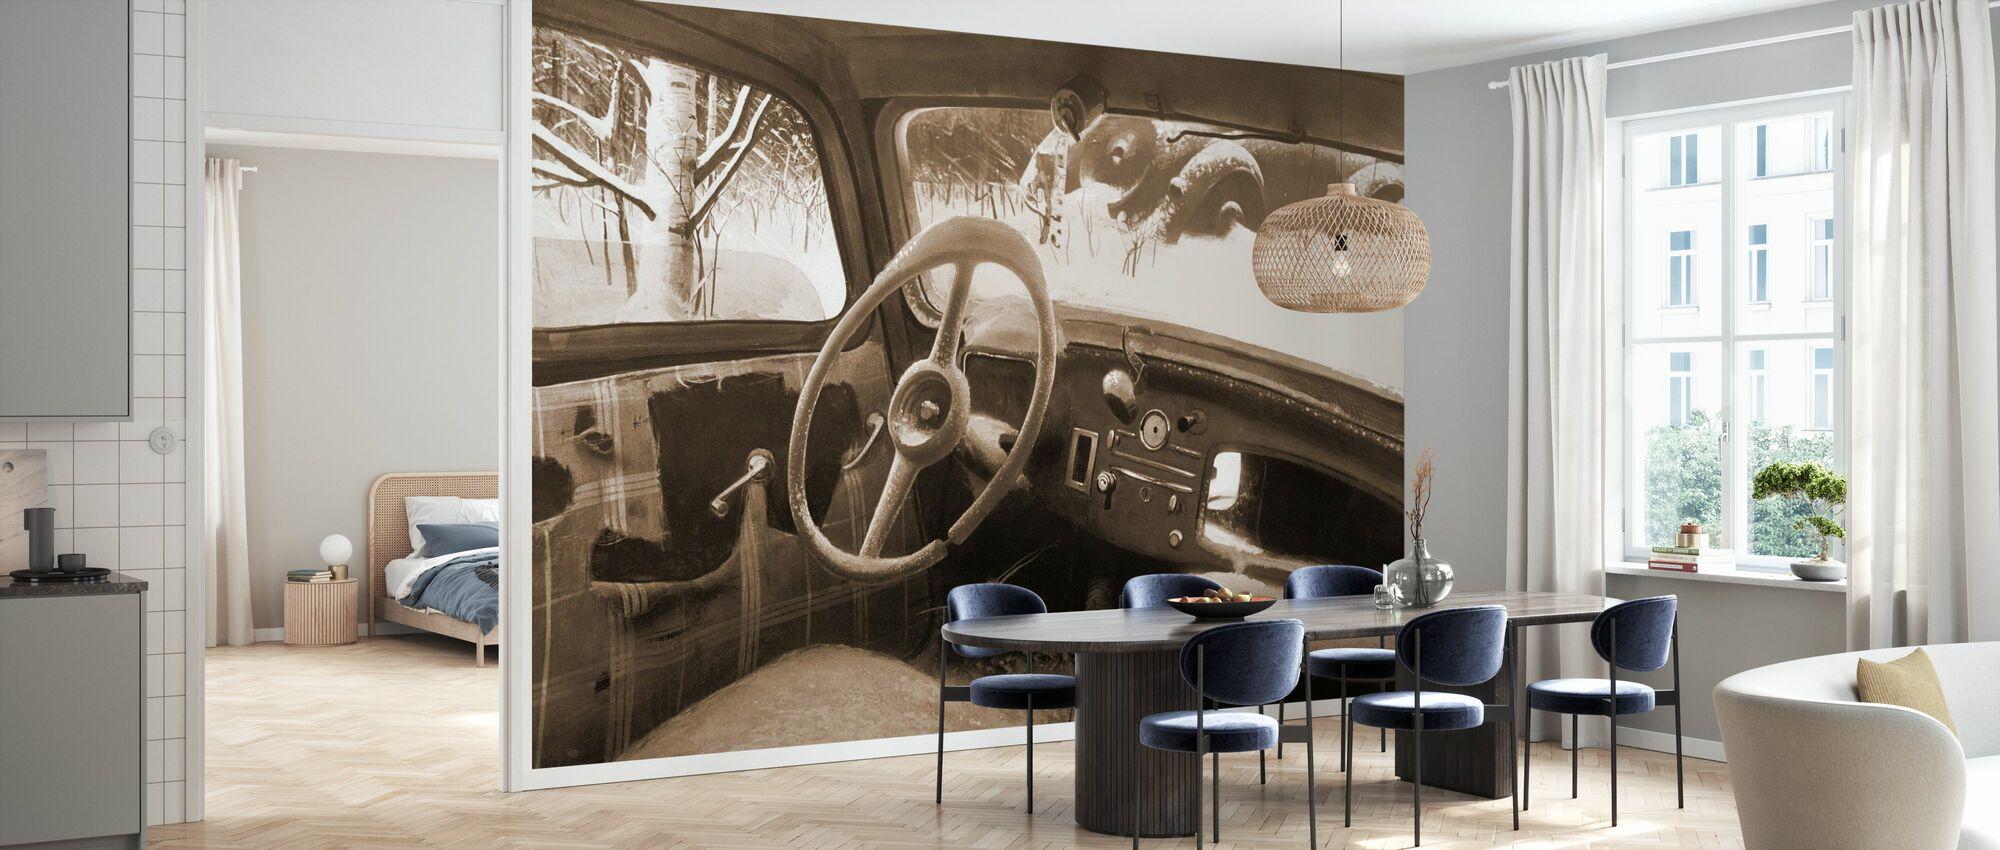 B11 Steering Wheel Sepia - Wallpaper - Kitchen